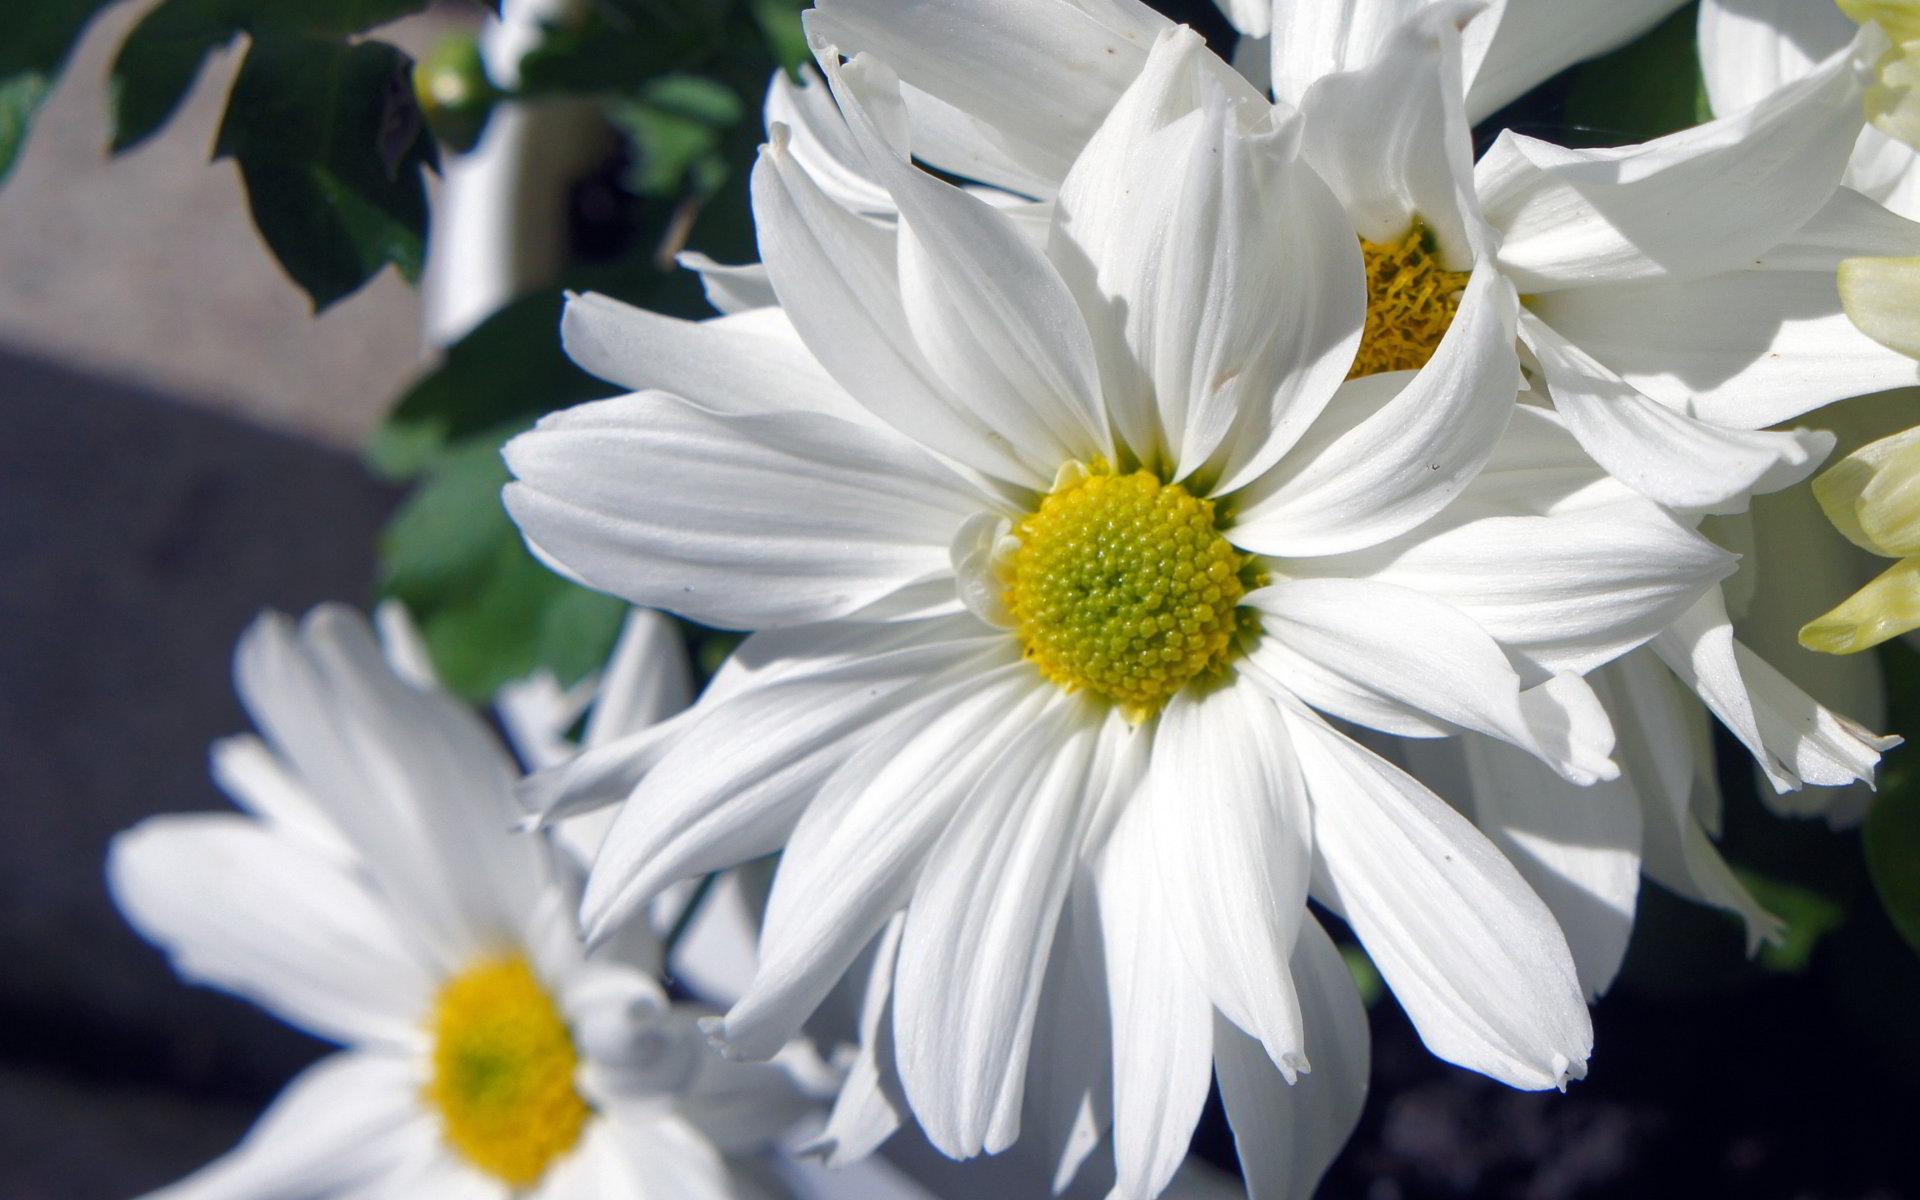 hinh anh hoa cuc dep 20